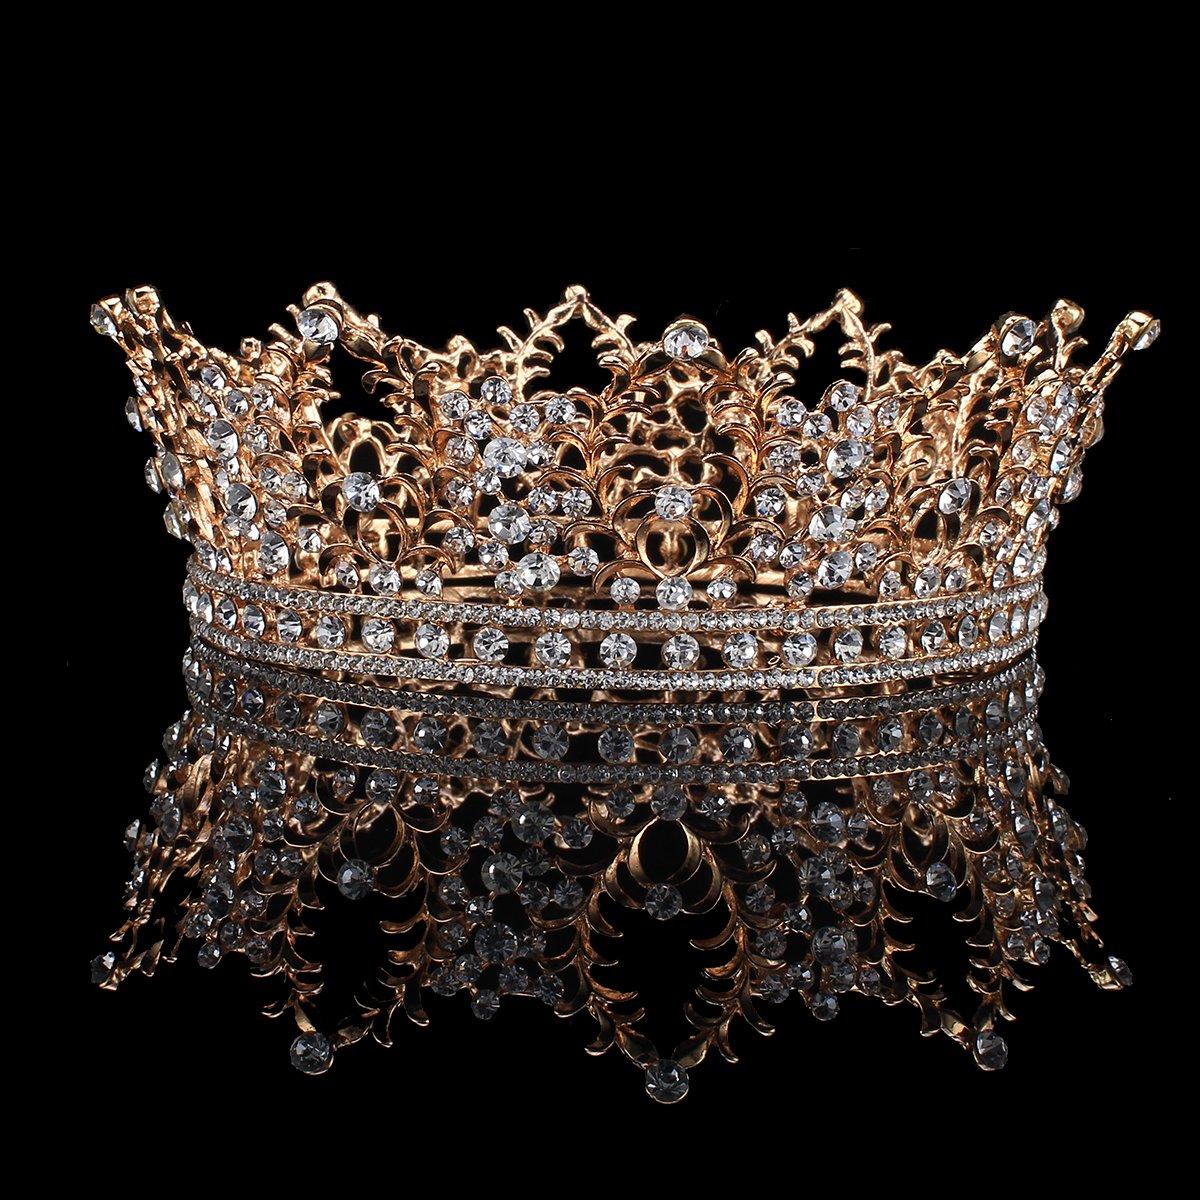 FUMUD Bridal Jewelry Baroque Tiara Crown Women Vintage Headband Rhinestone Crystal Crown (Roes gold)